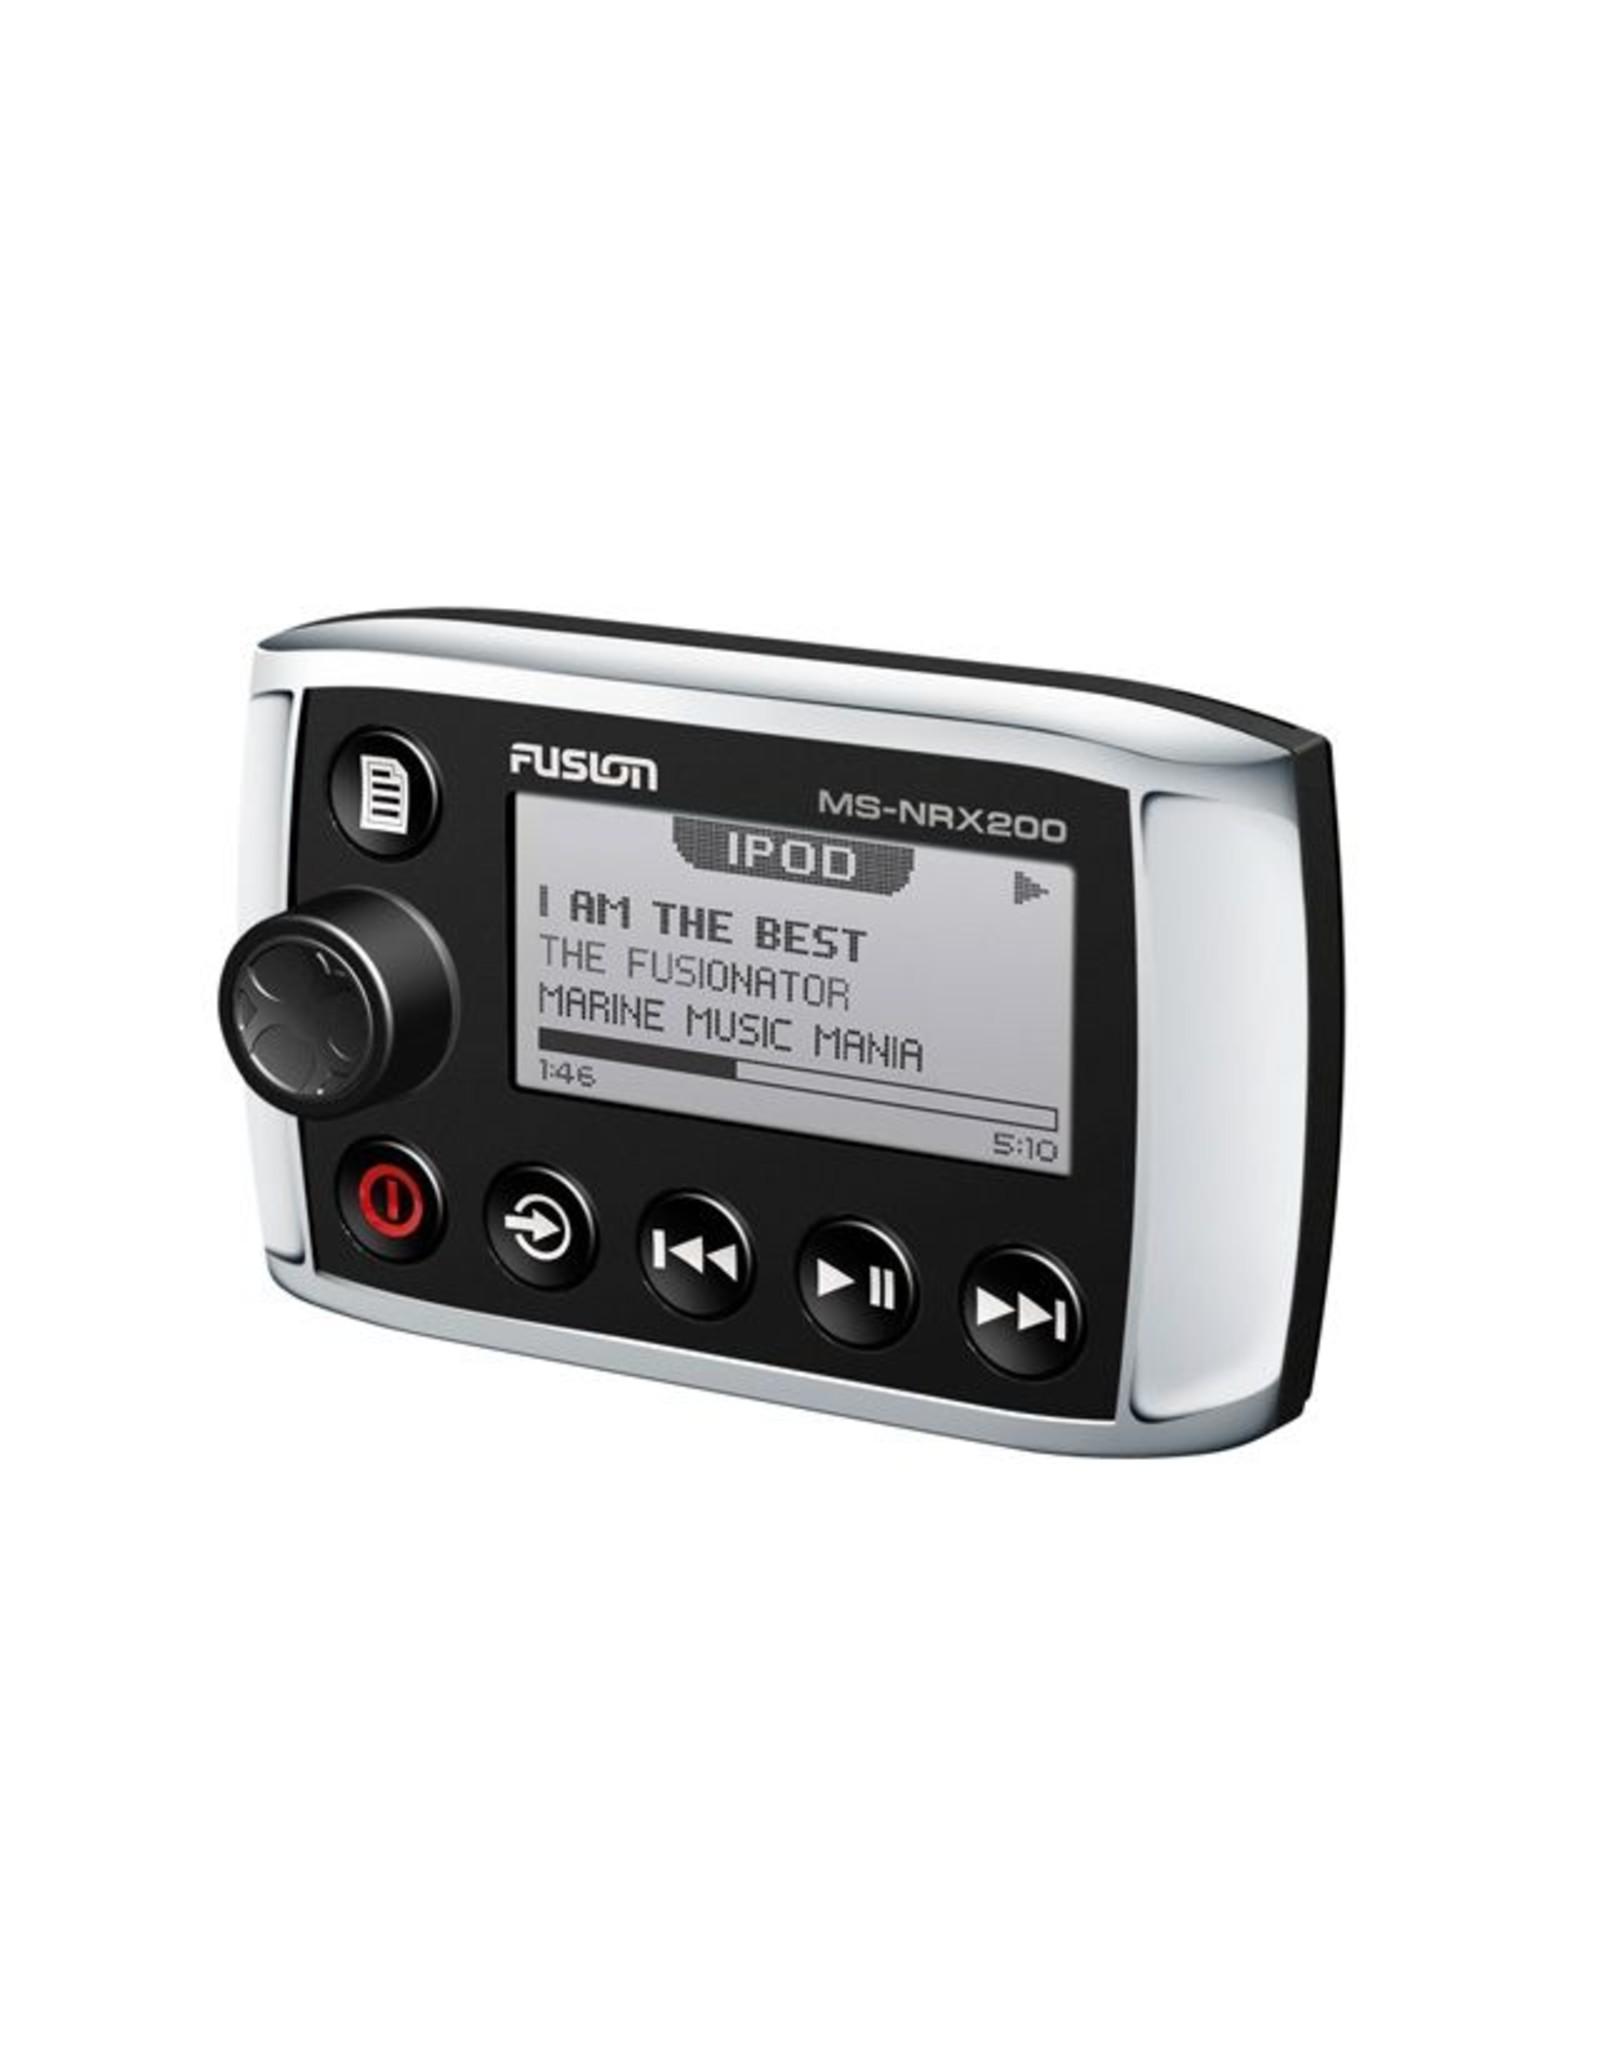 Fusion Fusion MS-NRX200i Afstandsbediening NMEA 2000